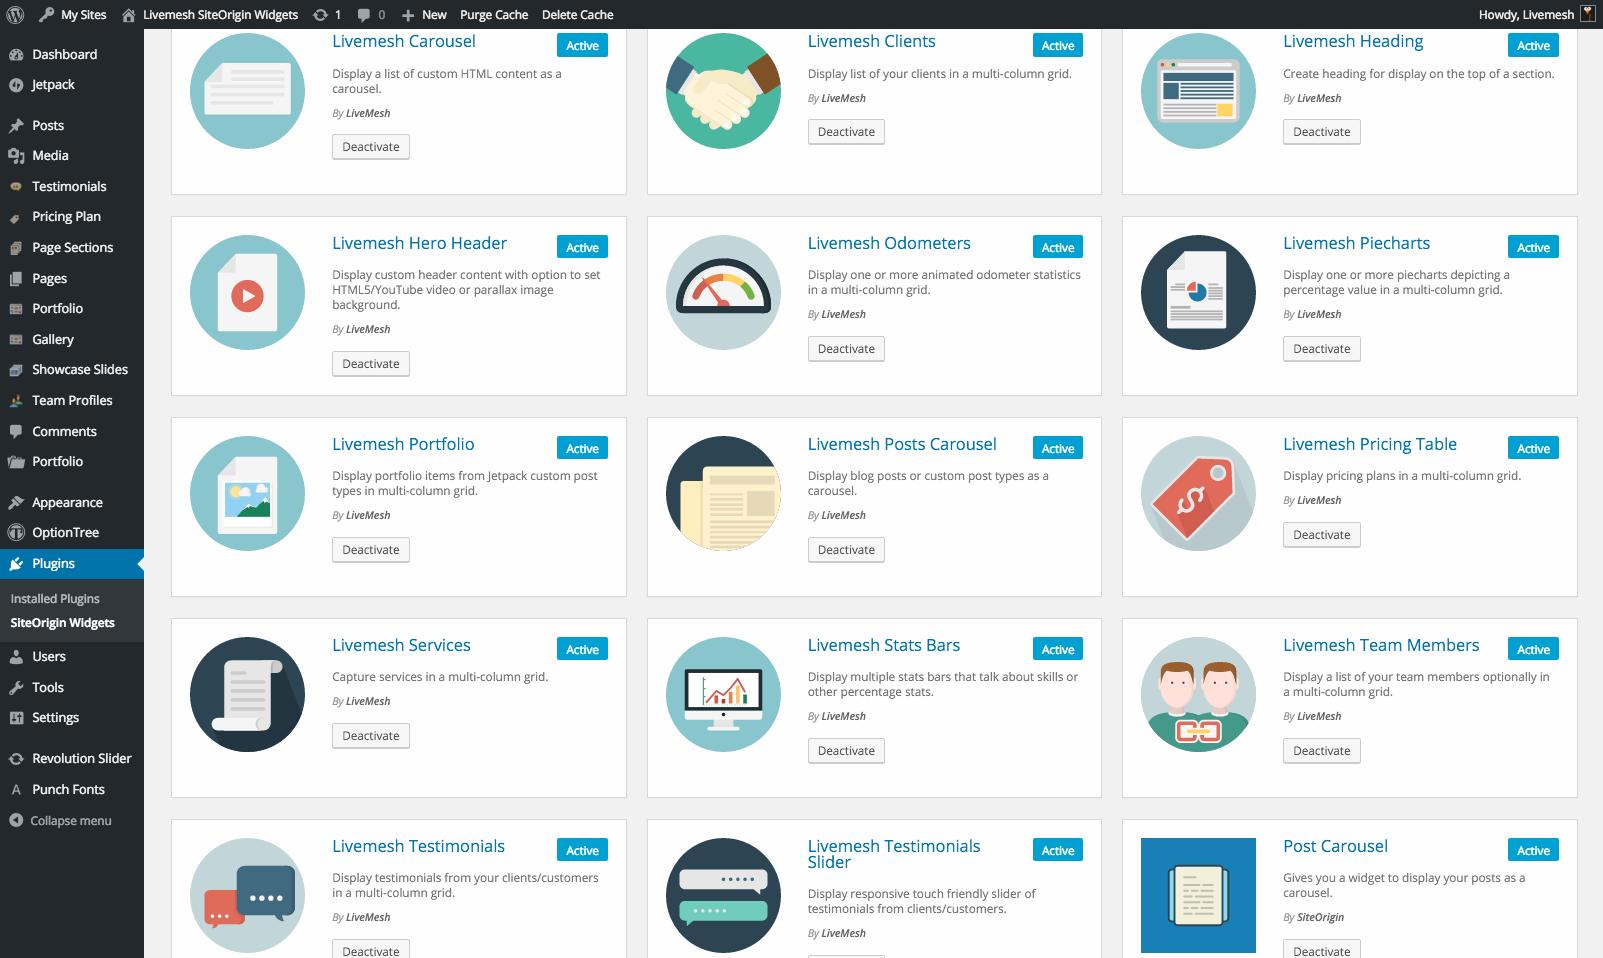 Download Livemesh SiteOrigin Widgets 2.5 – Free WordPress Plugin